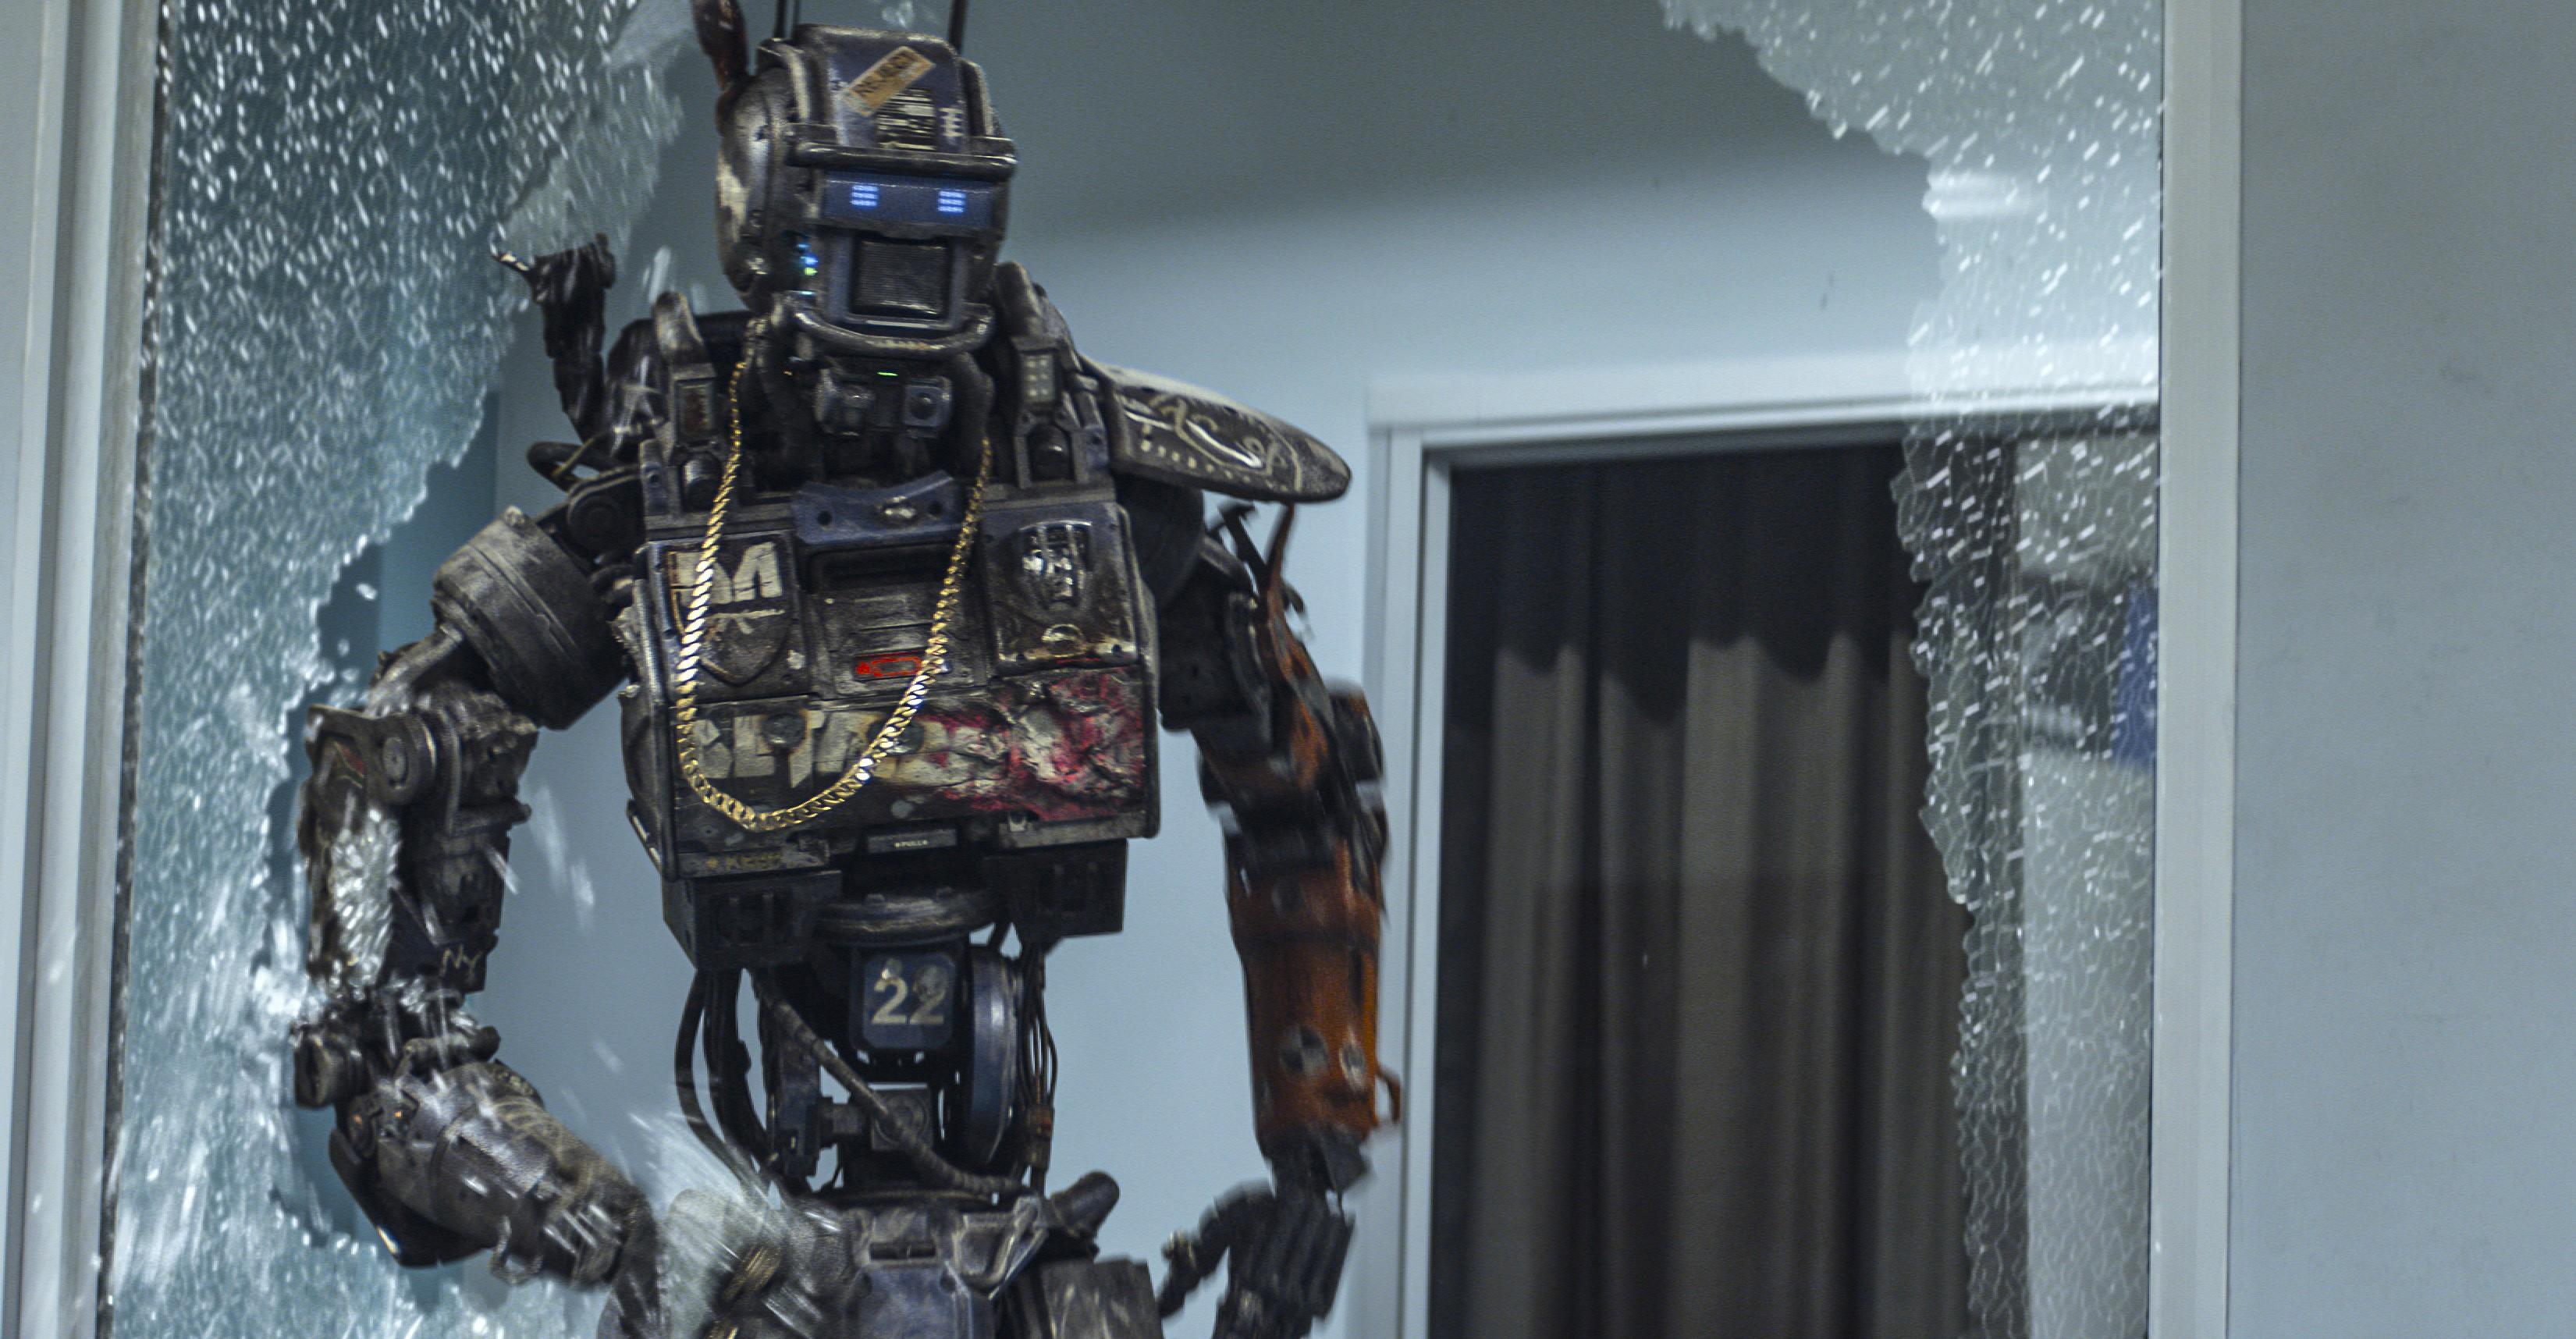 Wallpaper chappie best movies of 2015 wallpaper robot for Wallpaper home 2015